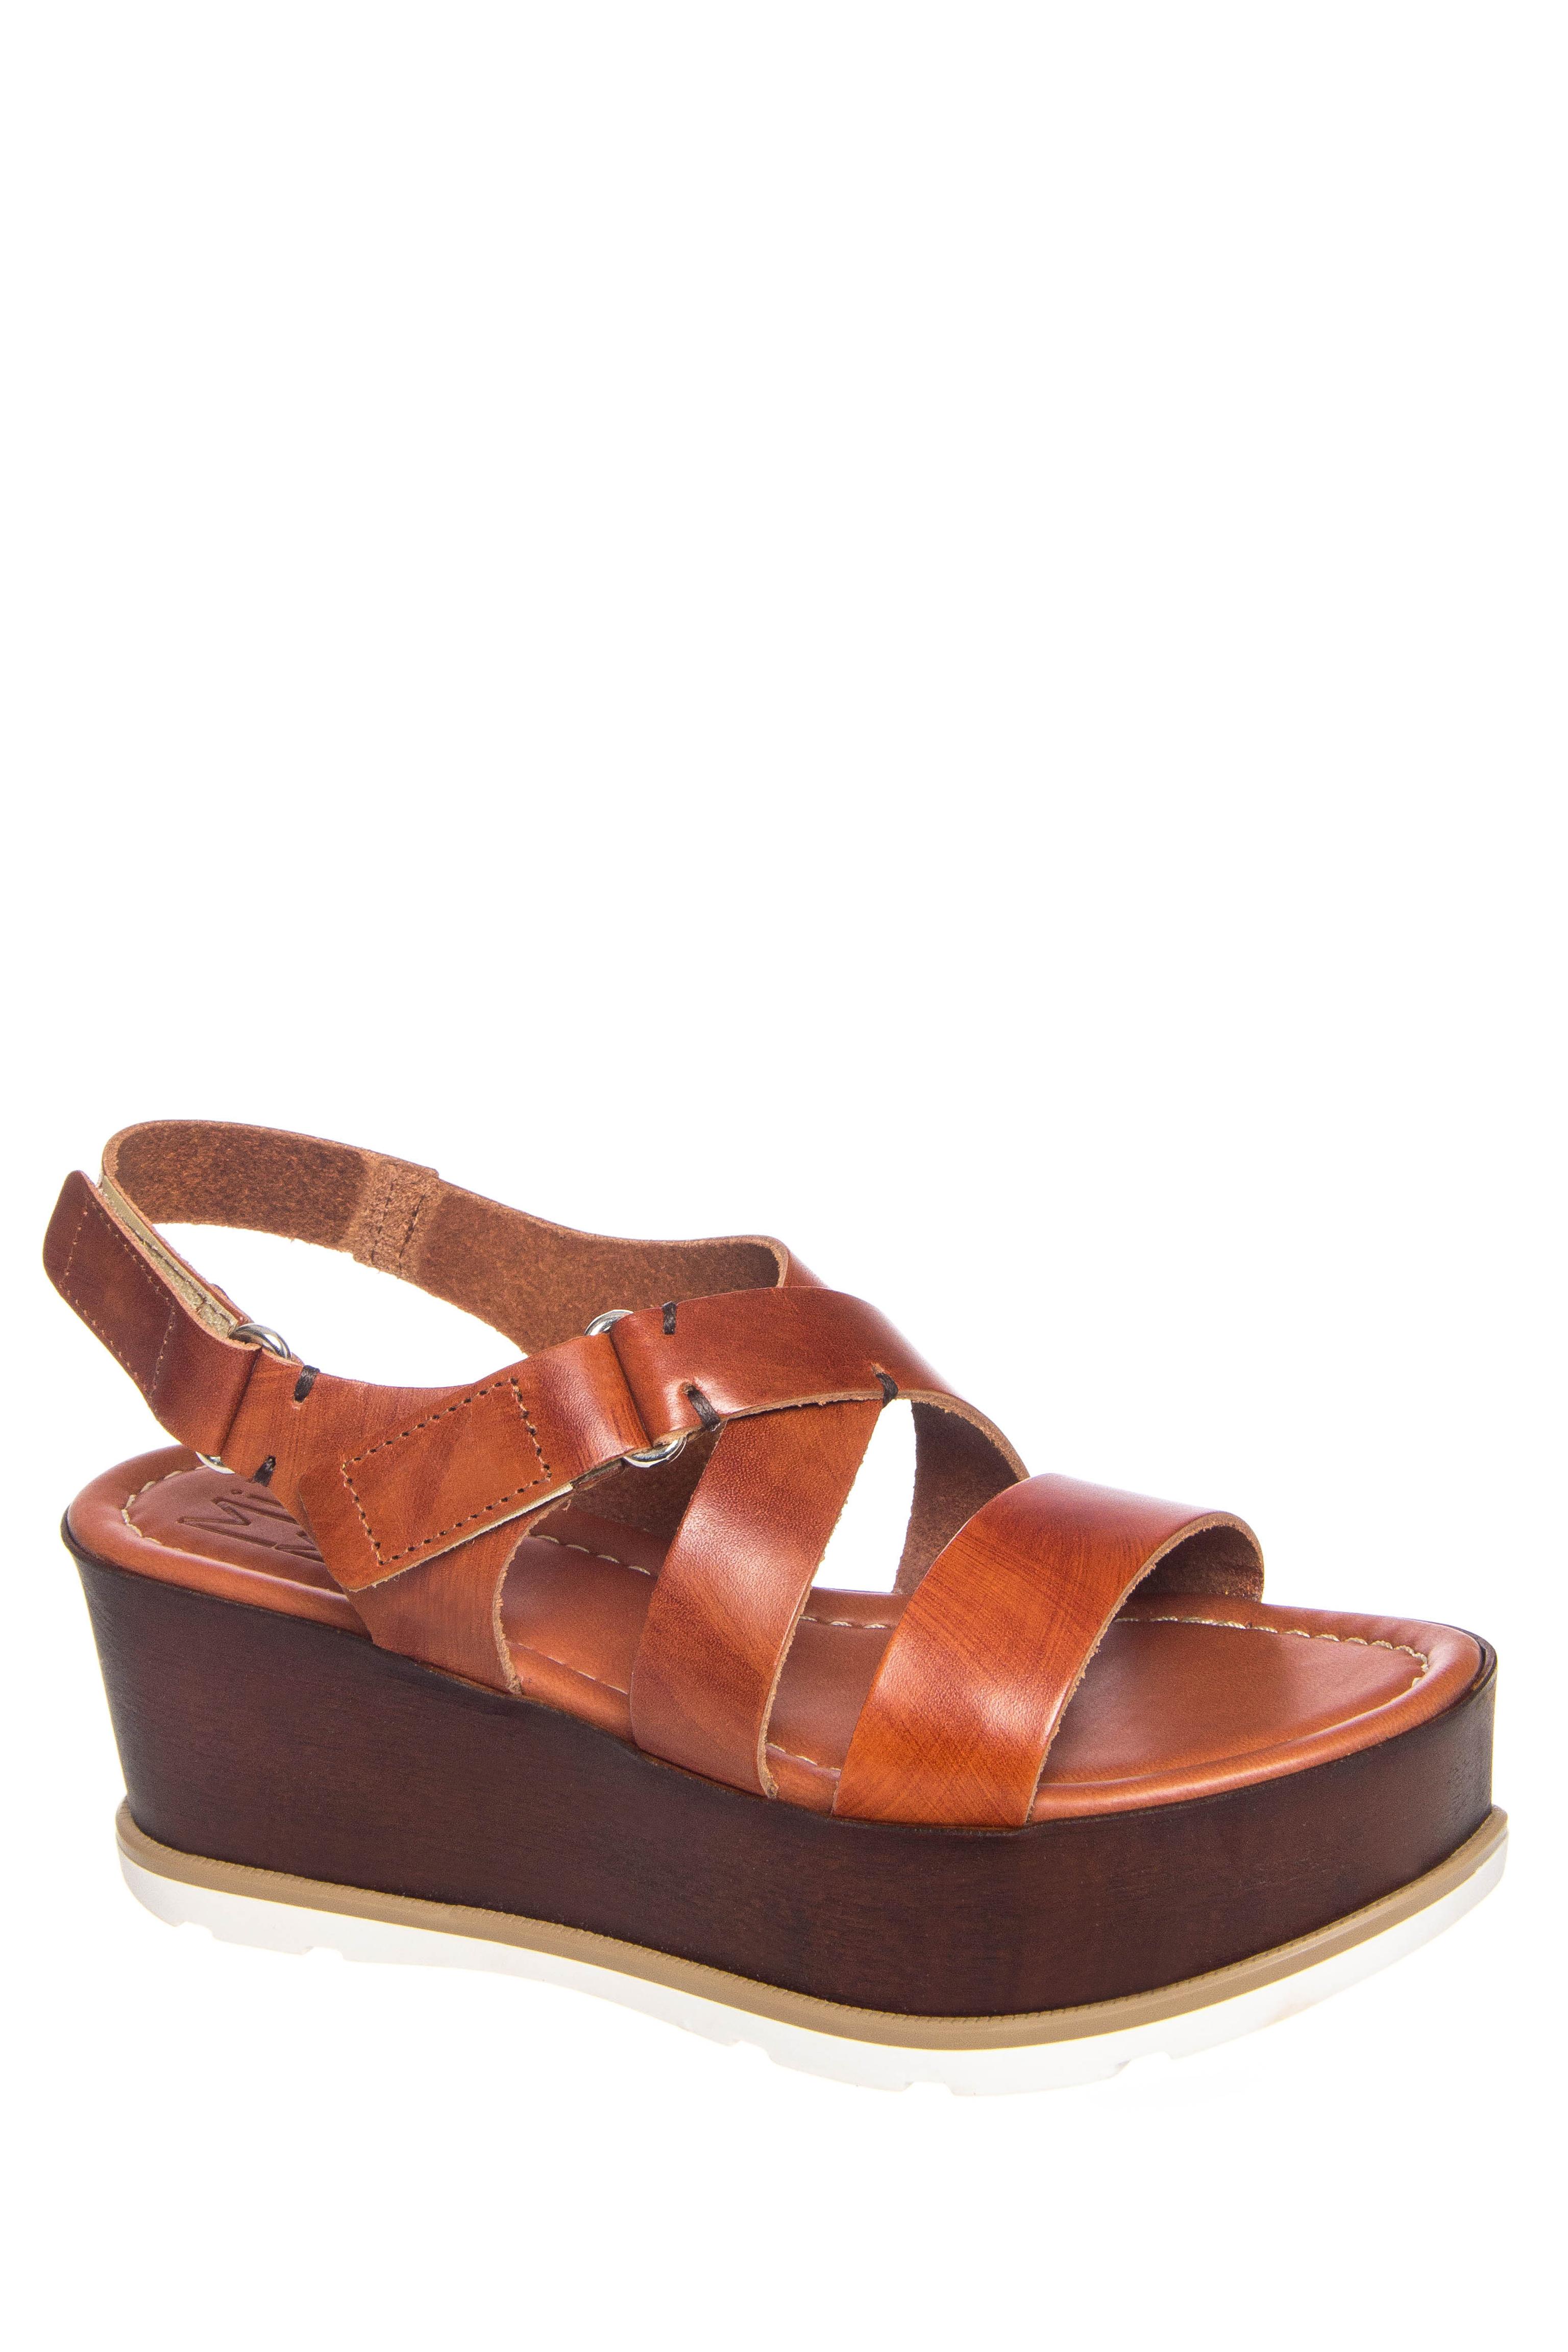 Miz Mooz Jessie Mid Wedge Platform Sandals - Cognac